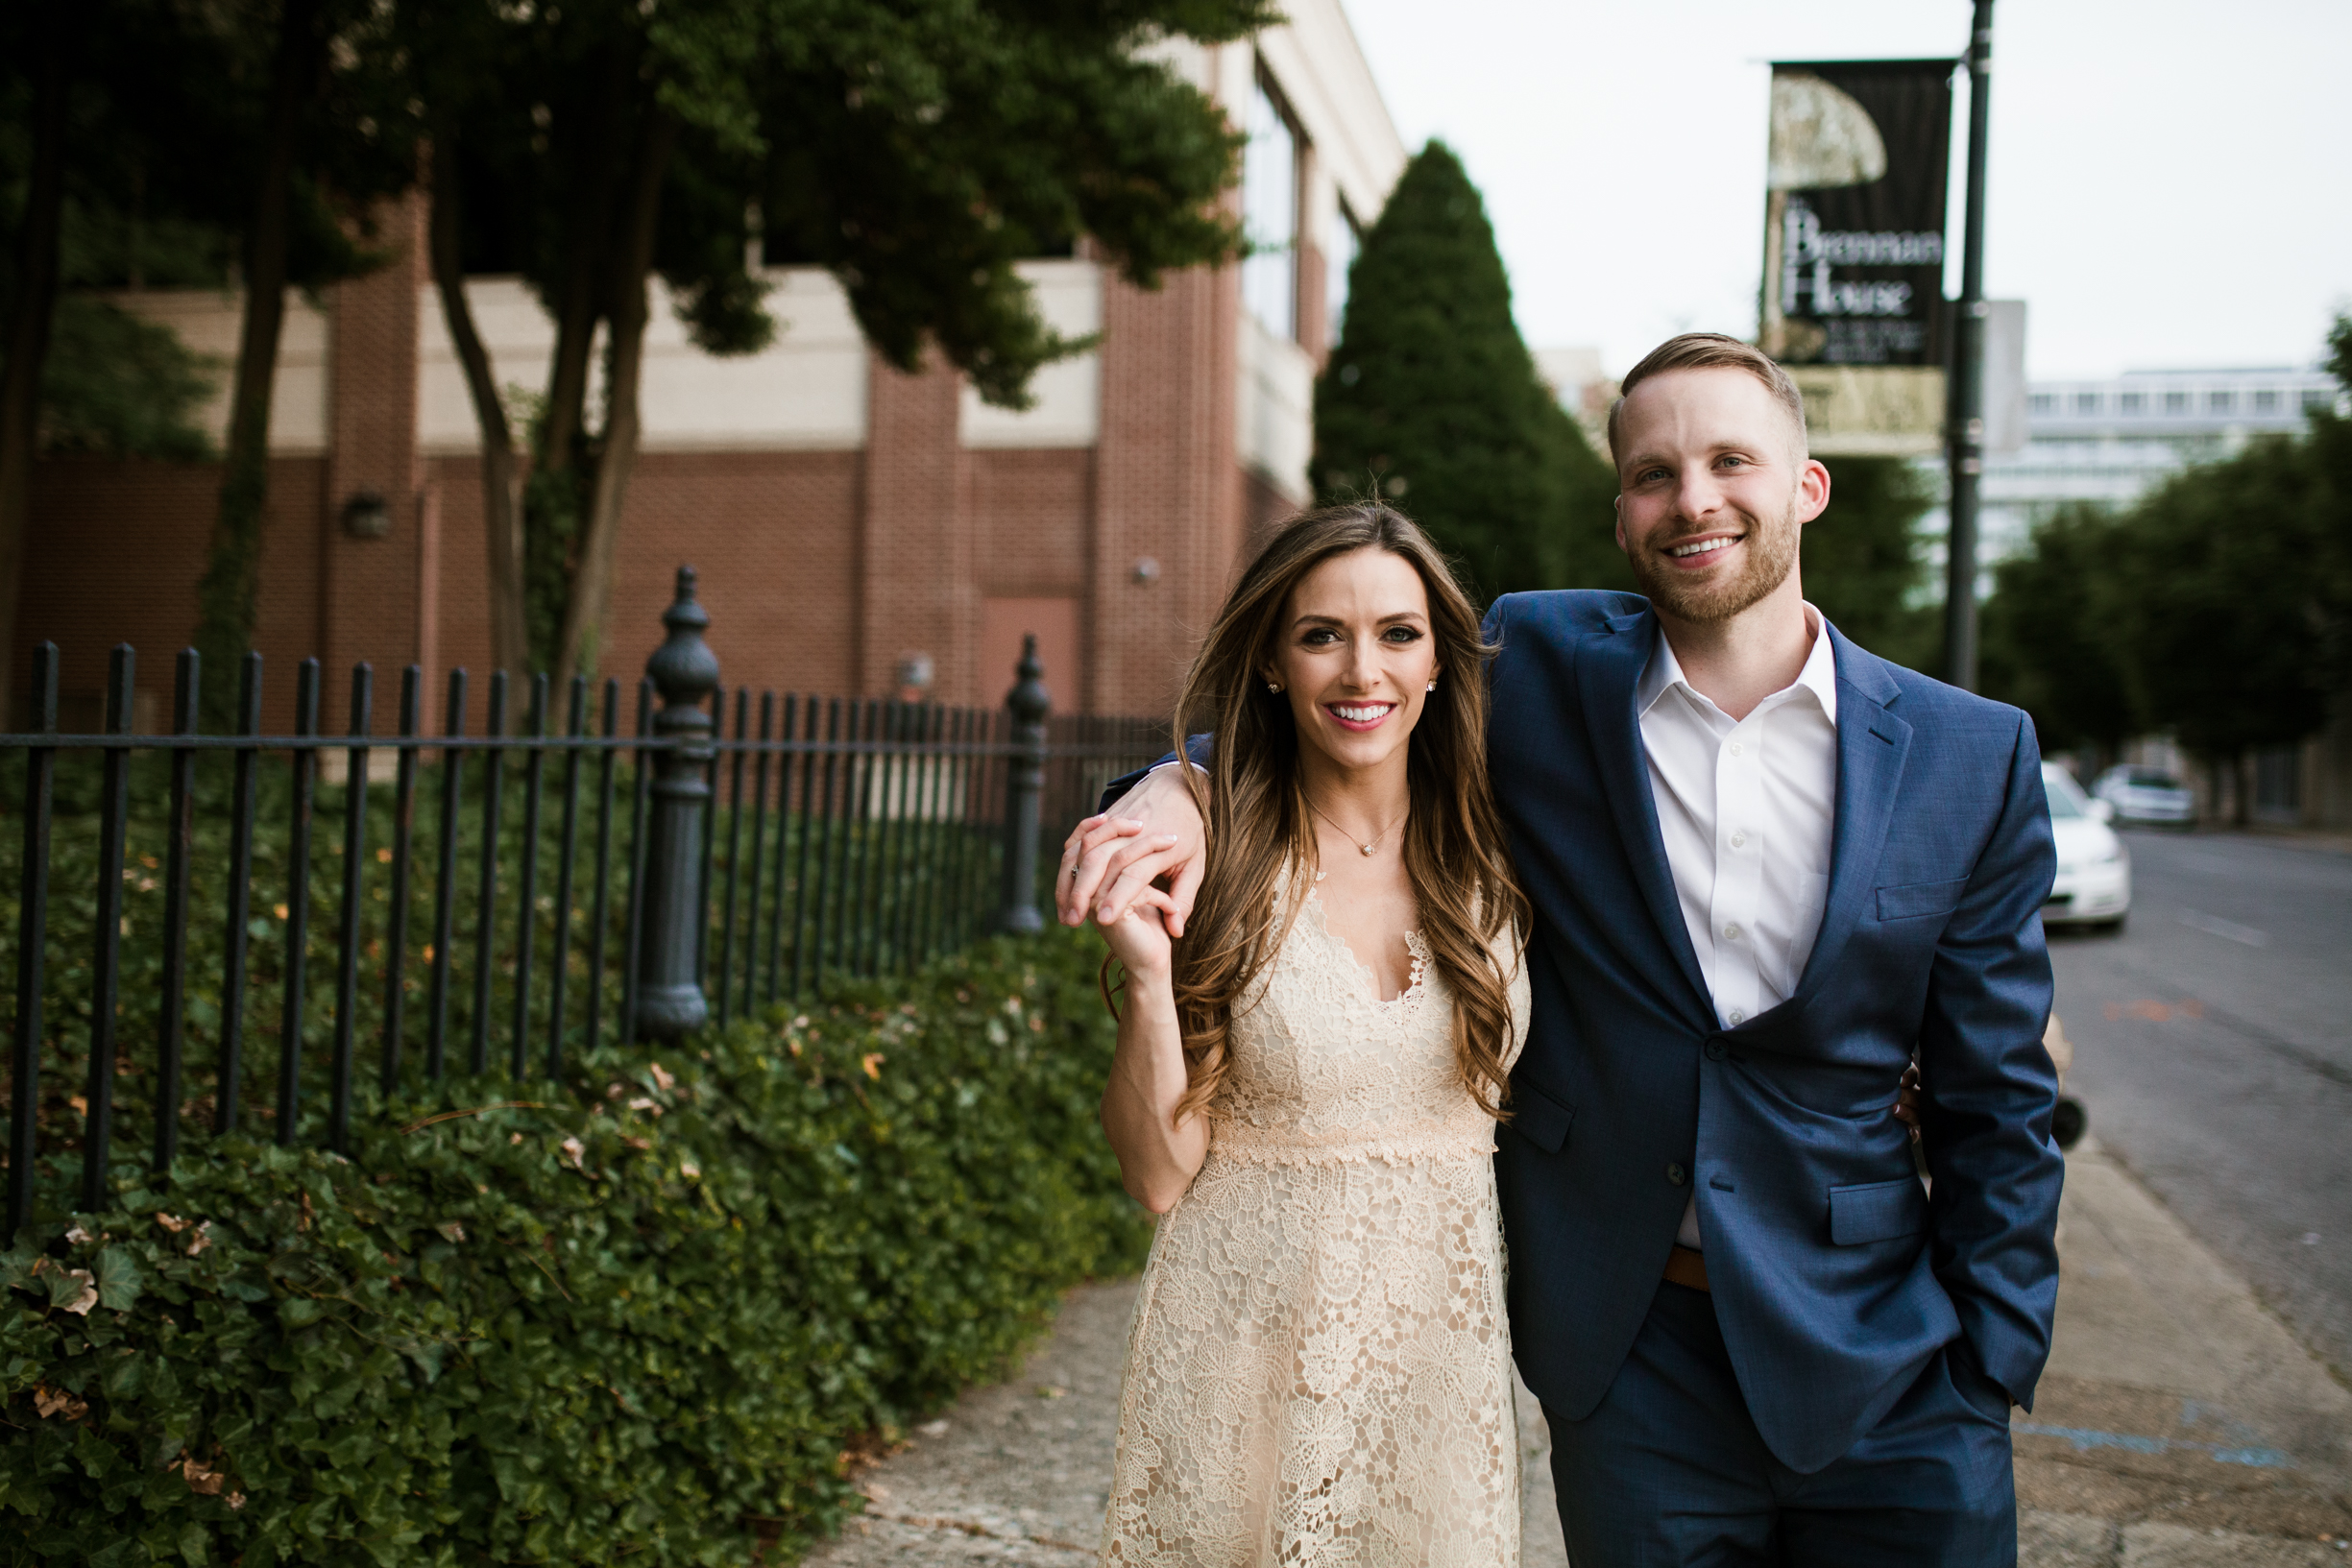 Victoria & Chad Engagement 2018 Crystal Ludwick Photo Louisville Kentucky Wedding Photographer WEBSITE (43 of 48).jpg